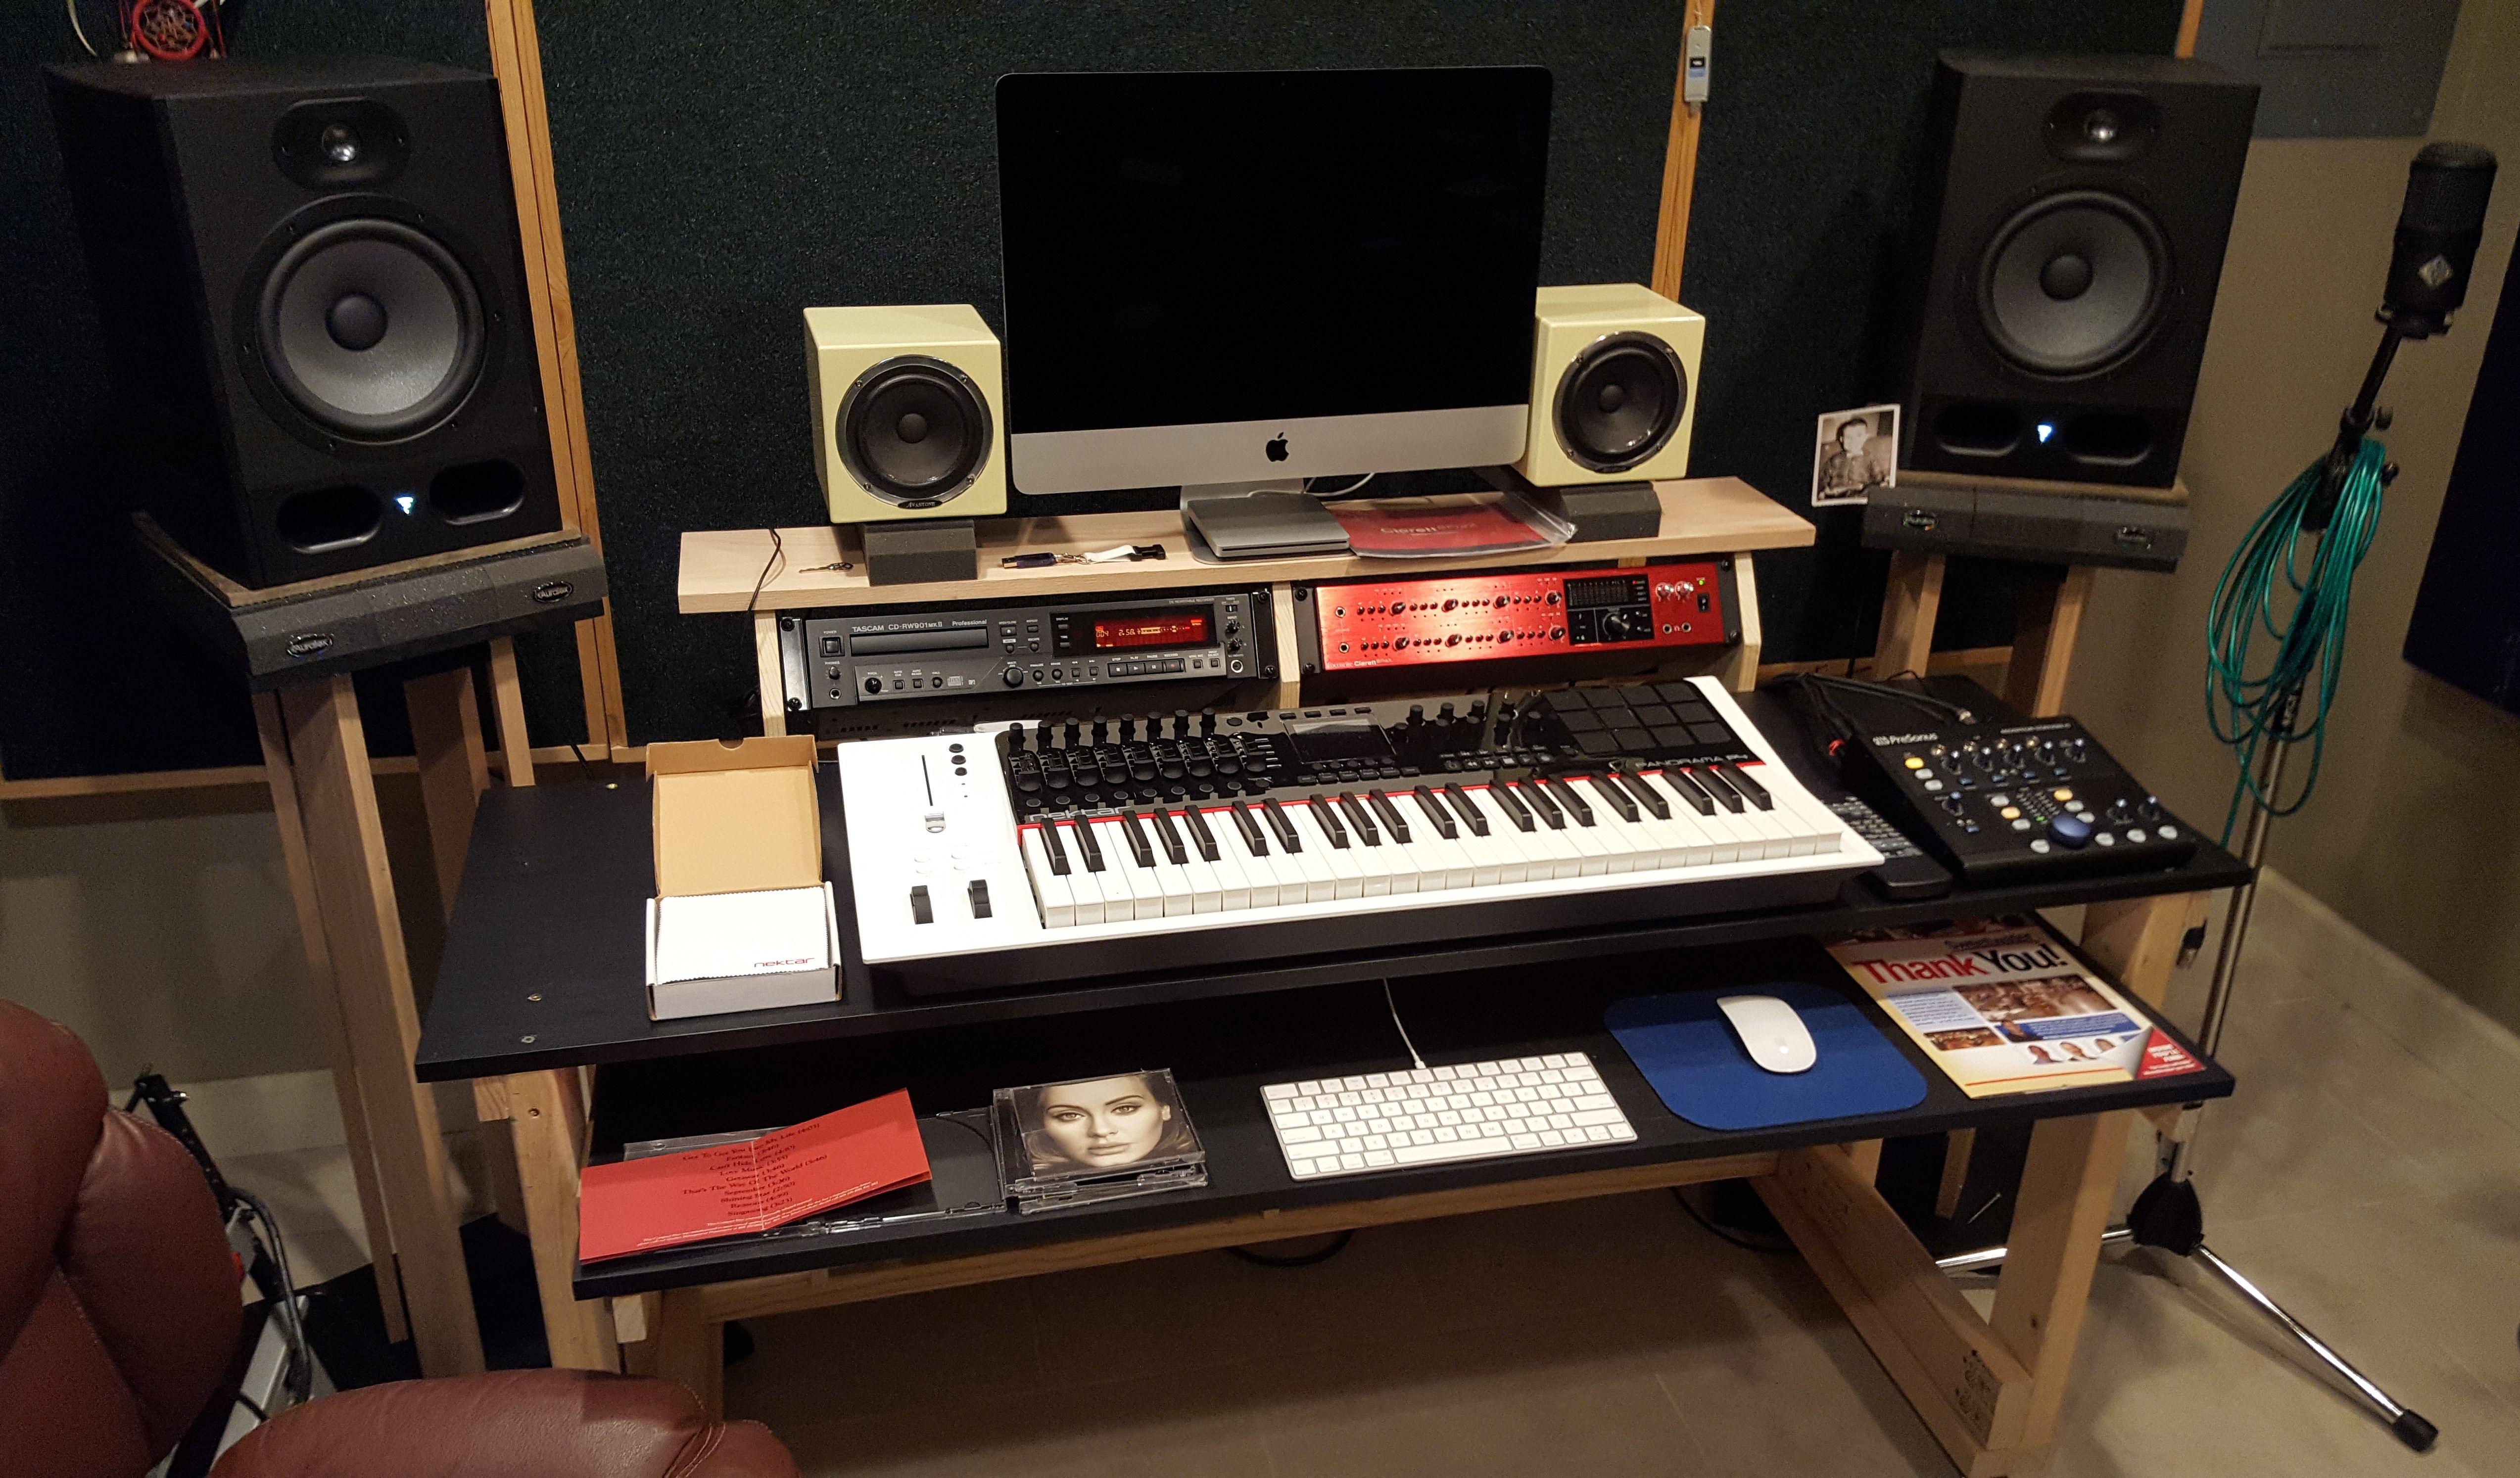 October 2016 New Studio Desk New Desk Design